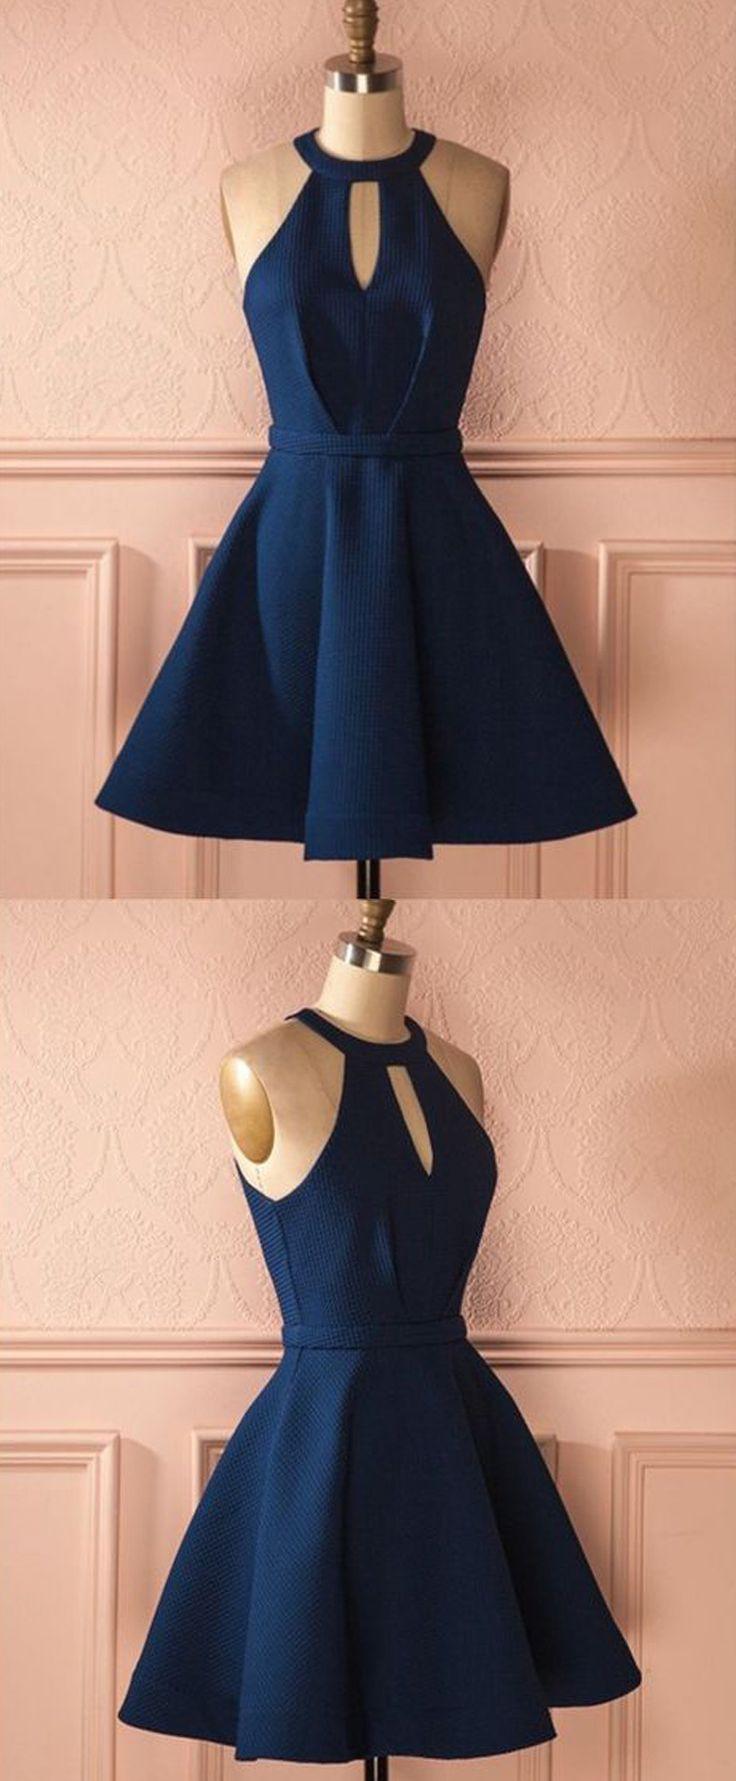 Formal Fantastisch Dunkelblaues Kurzes Kleid Galerie15 Schön Dunkelblaues Kurzes Kleid Vertrieb